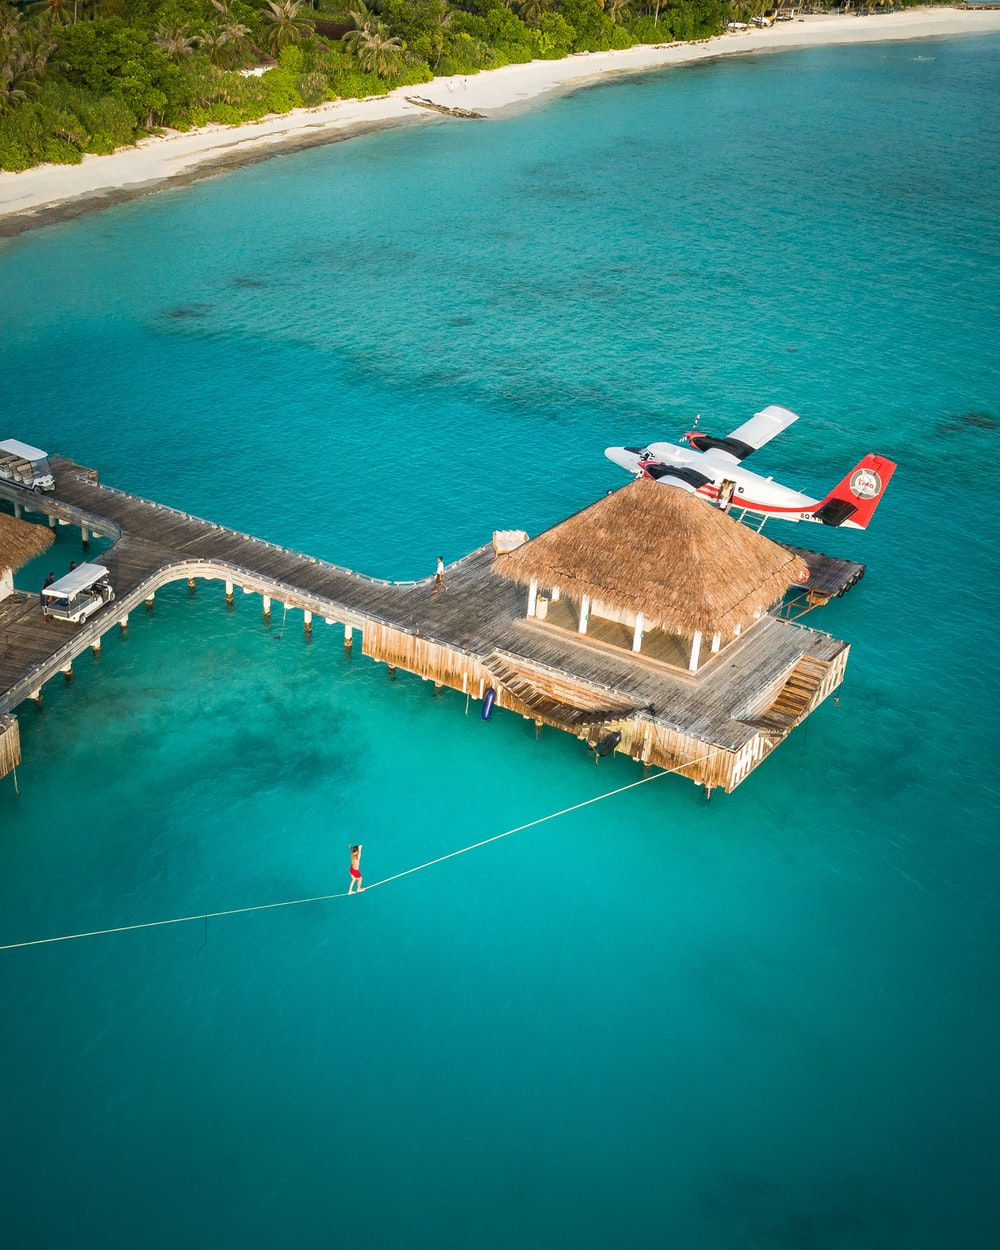 brown wooden cottage beside plane